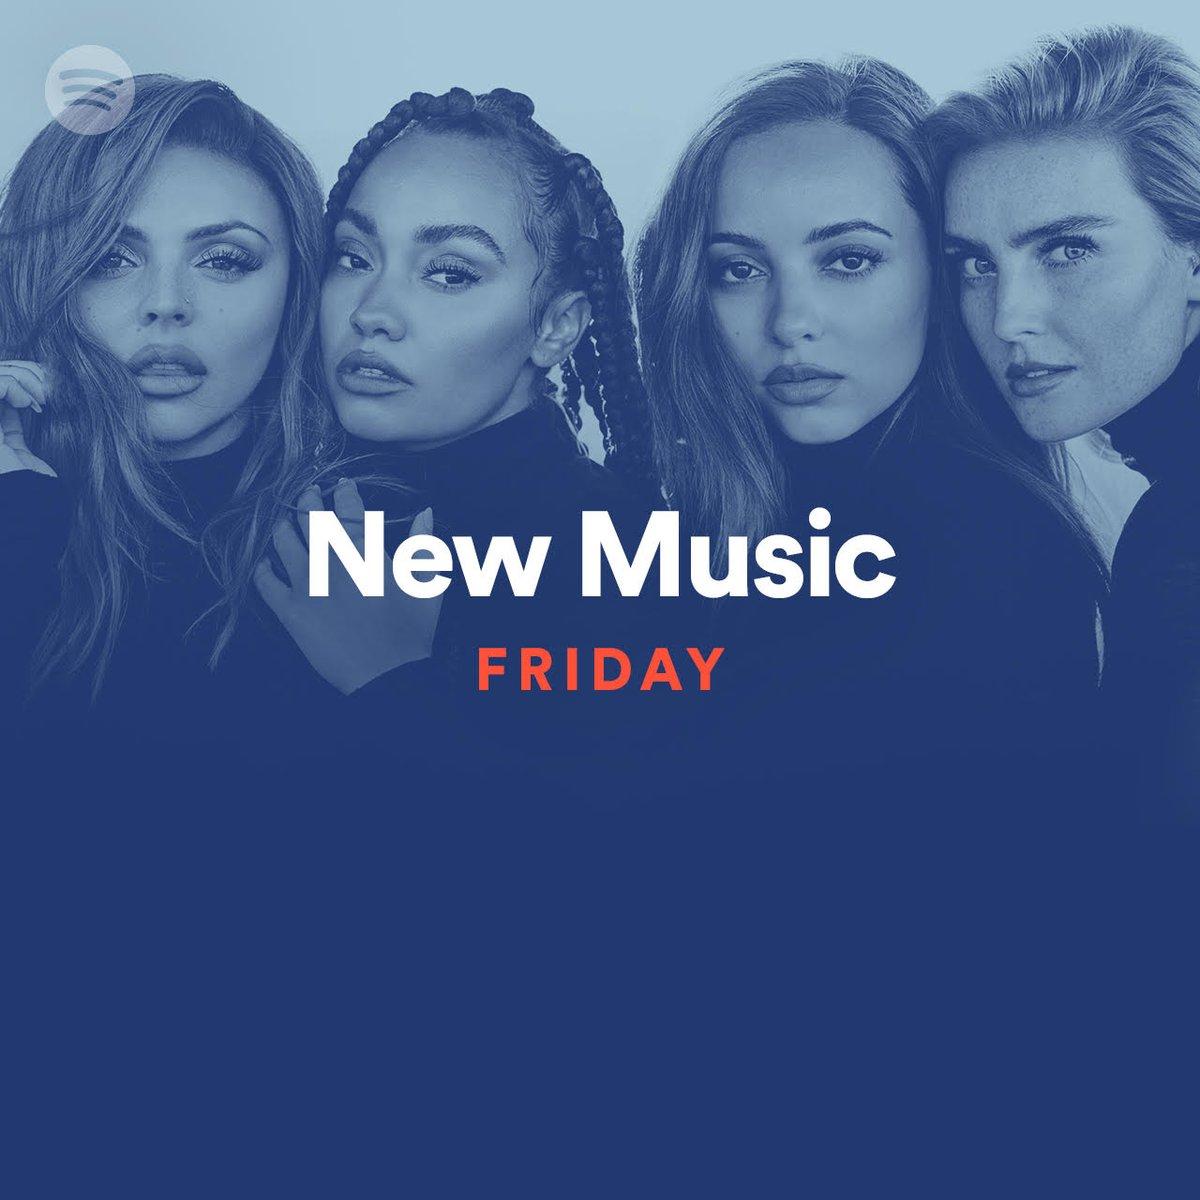 #NewMusicFriday Latest News Trends Updates Images - SpotifyUK